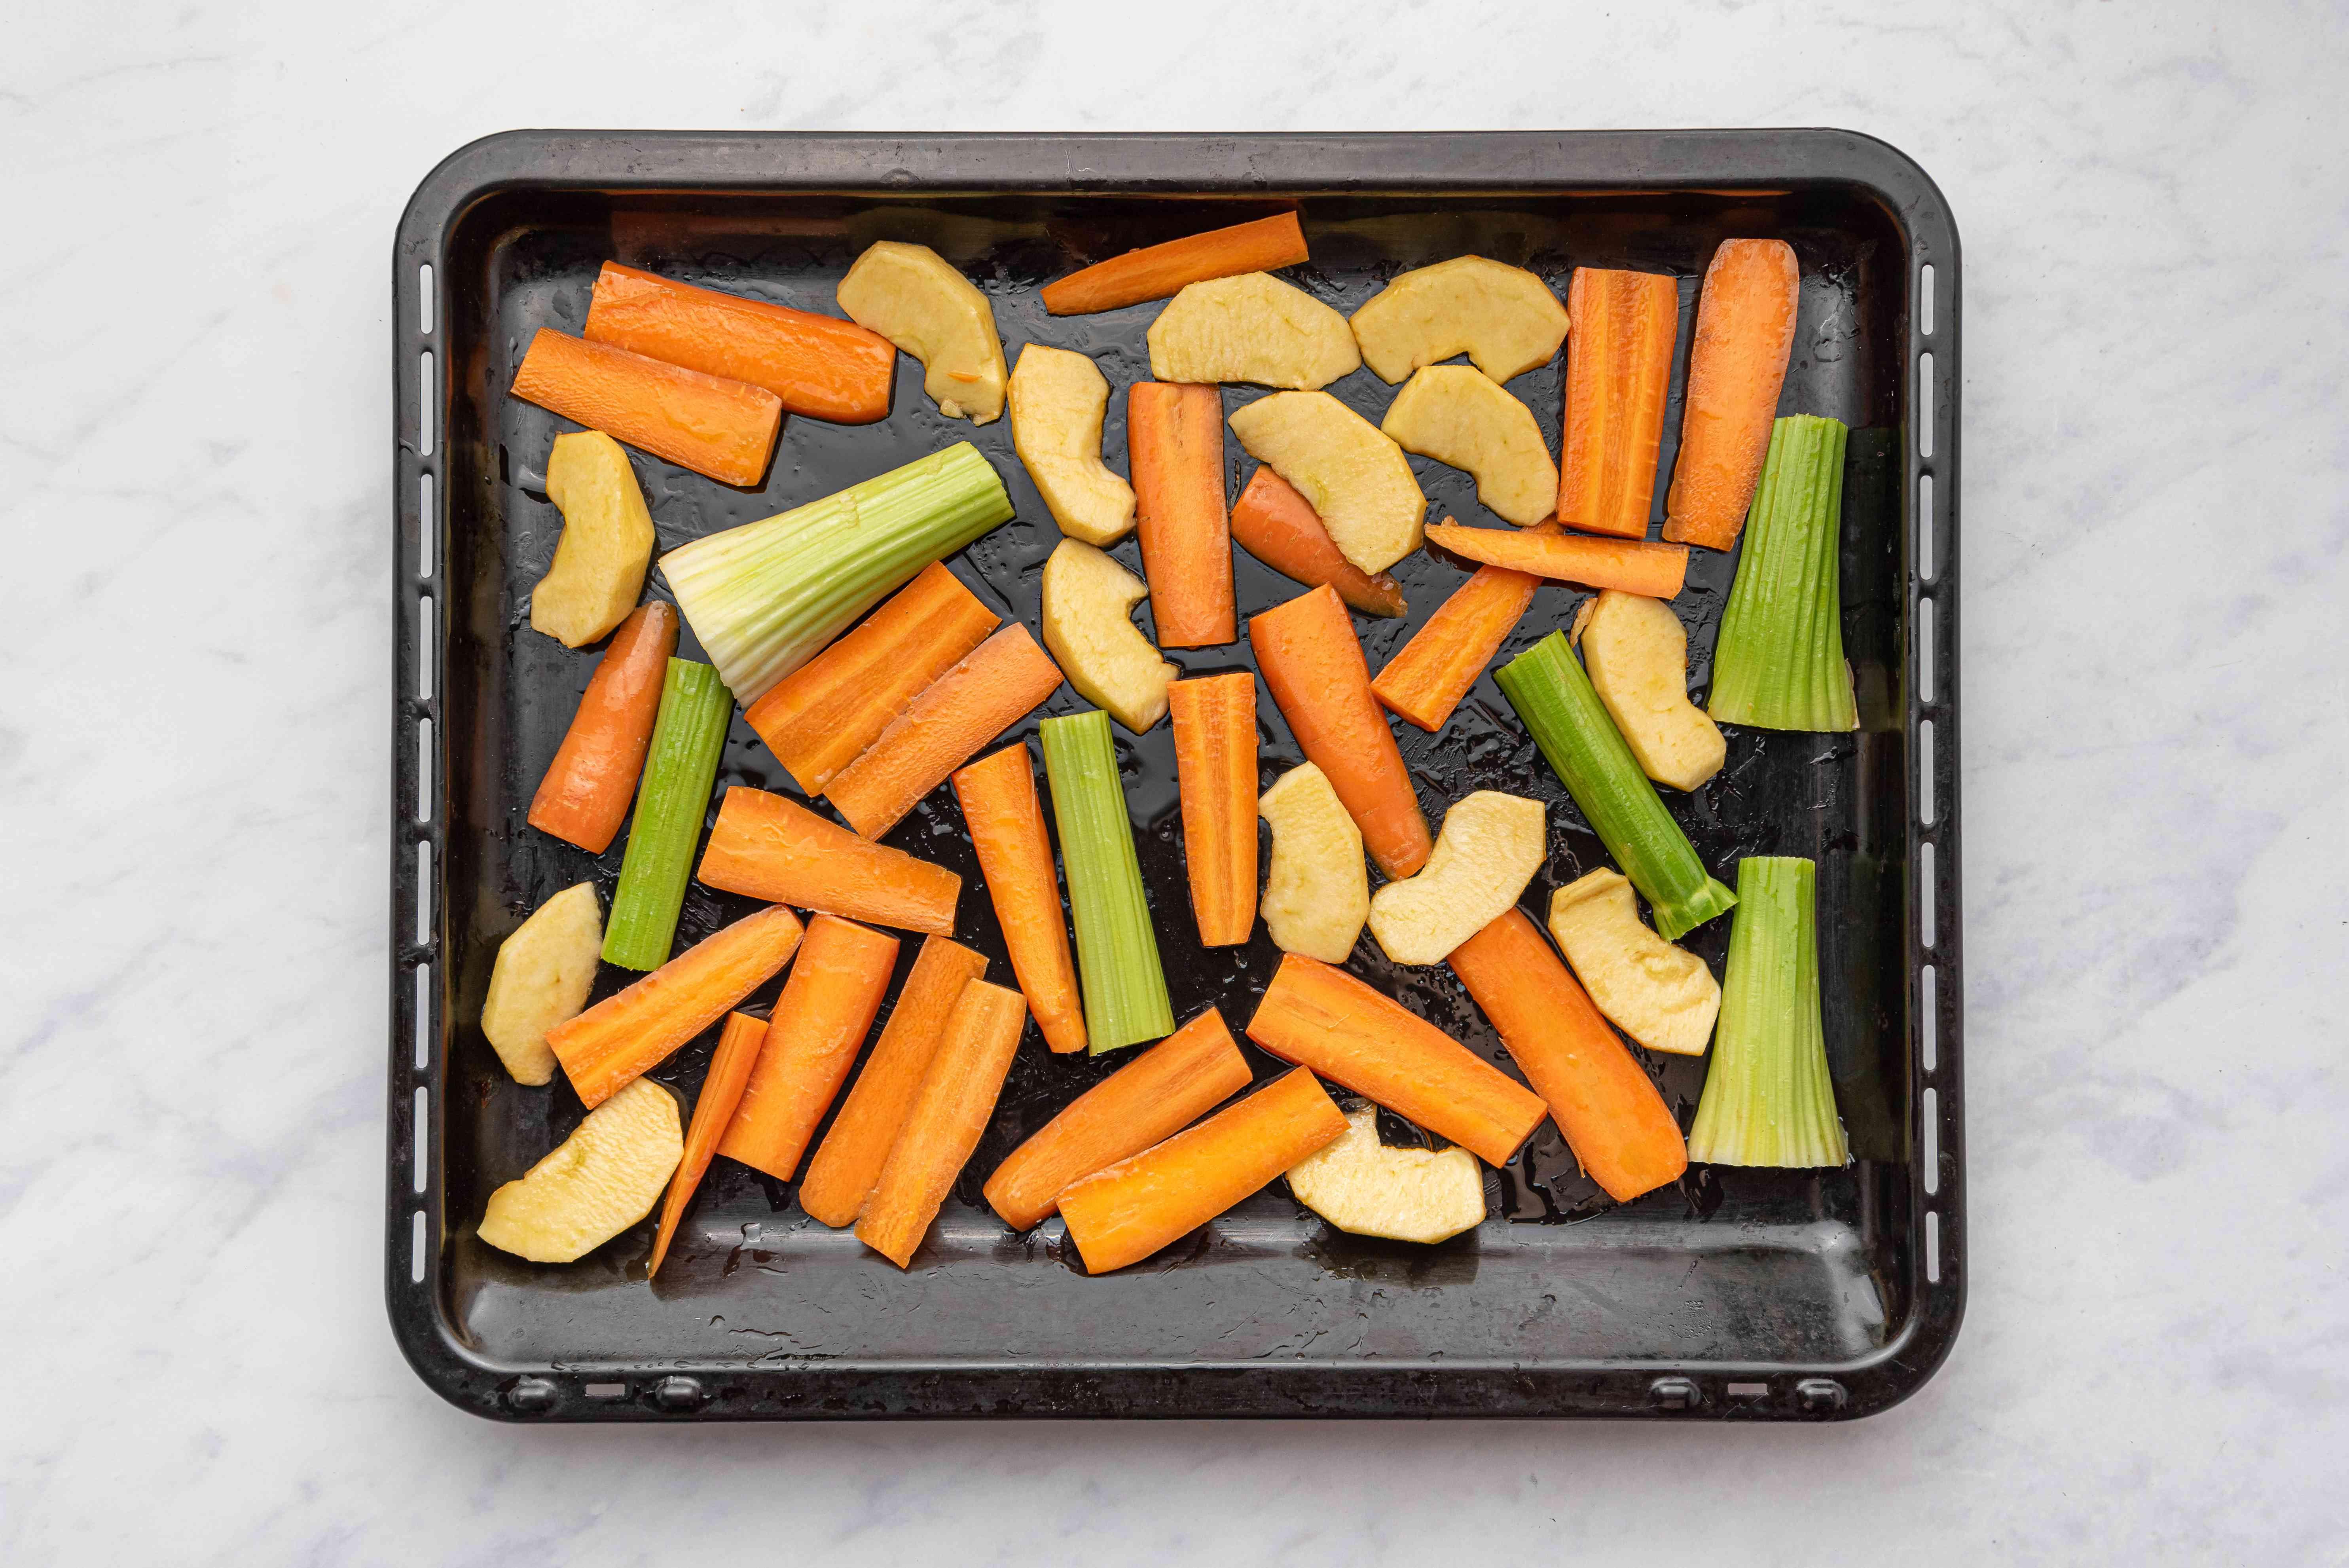 vegetables on a baking sheet